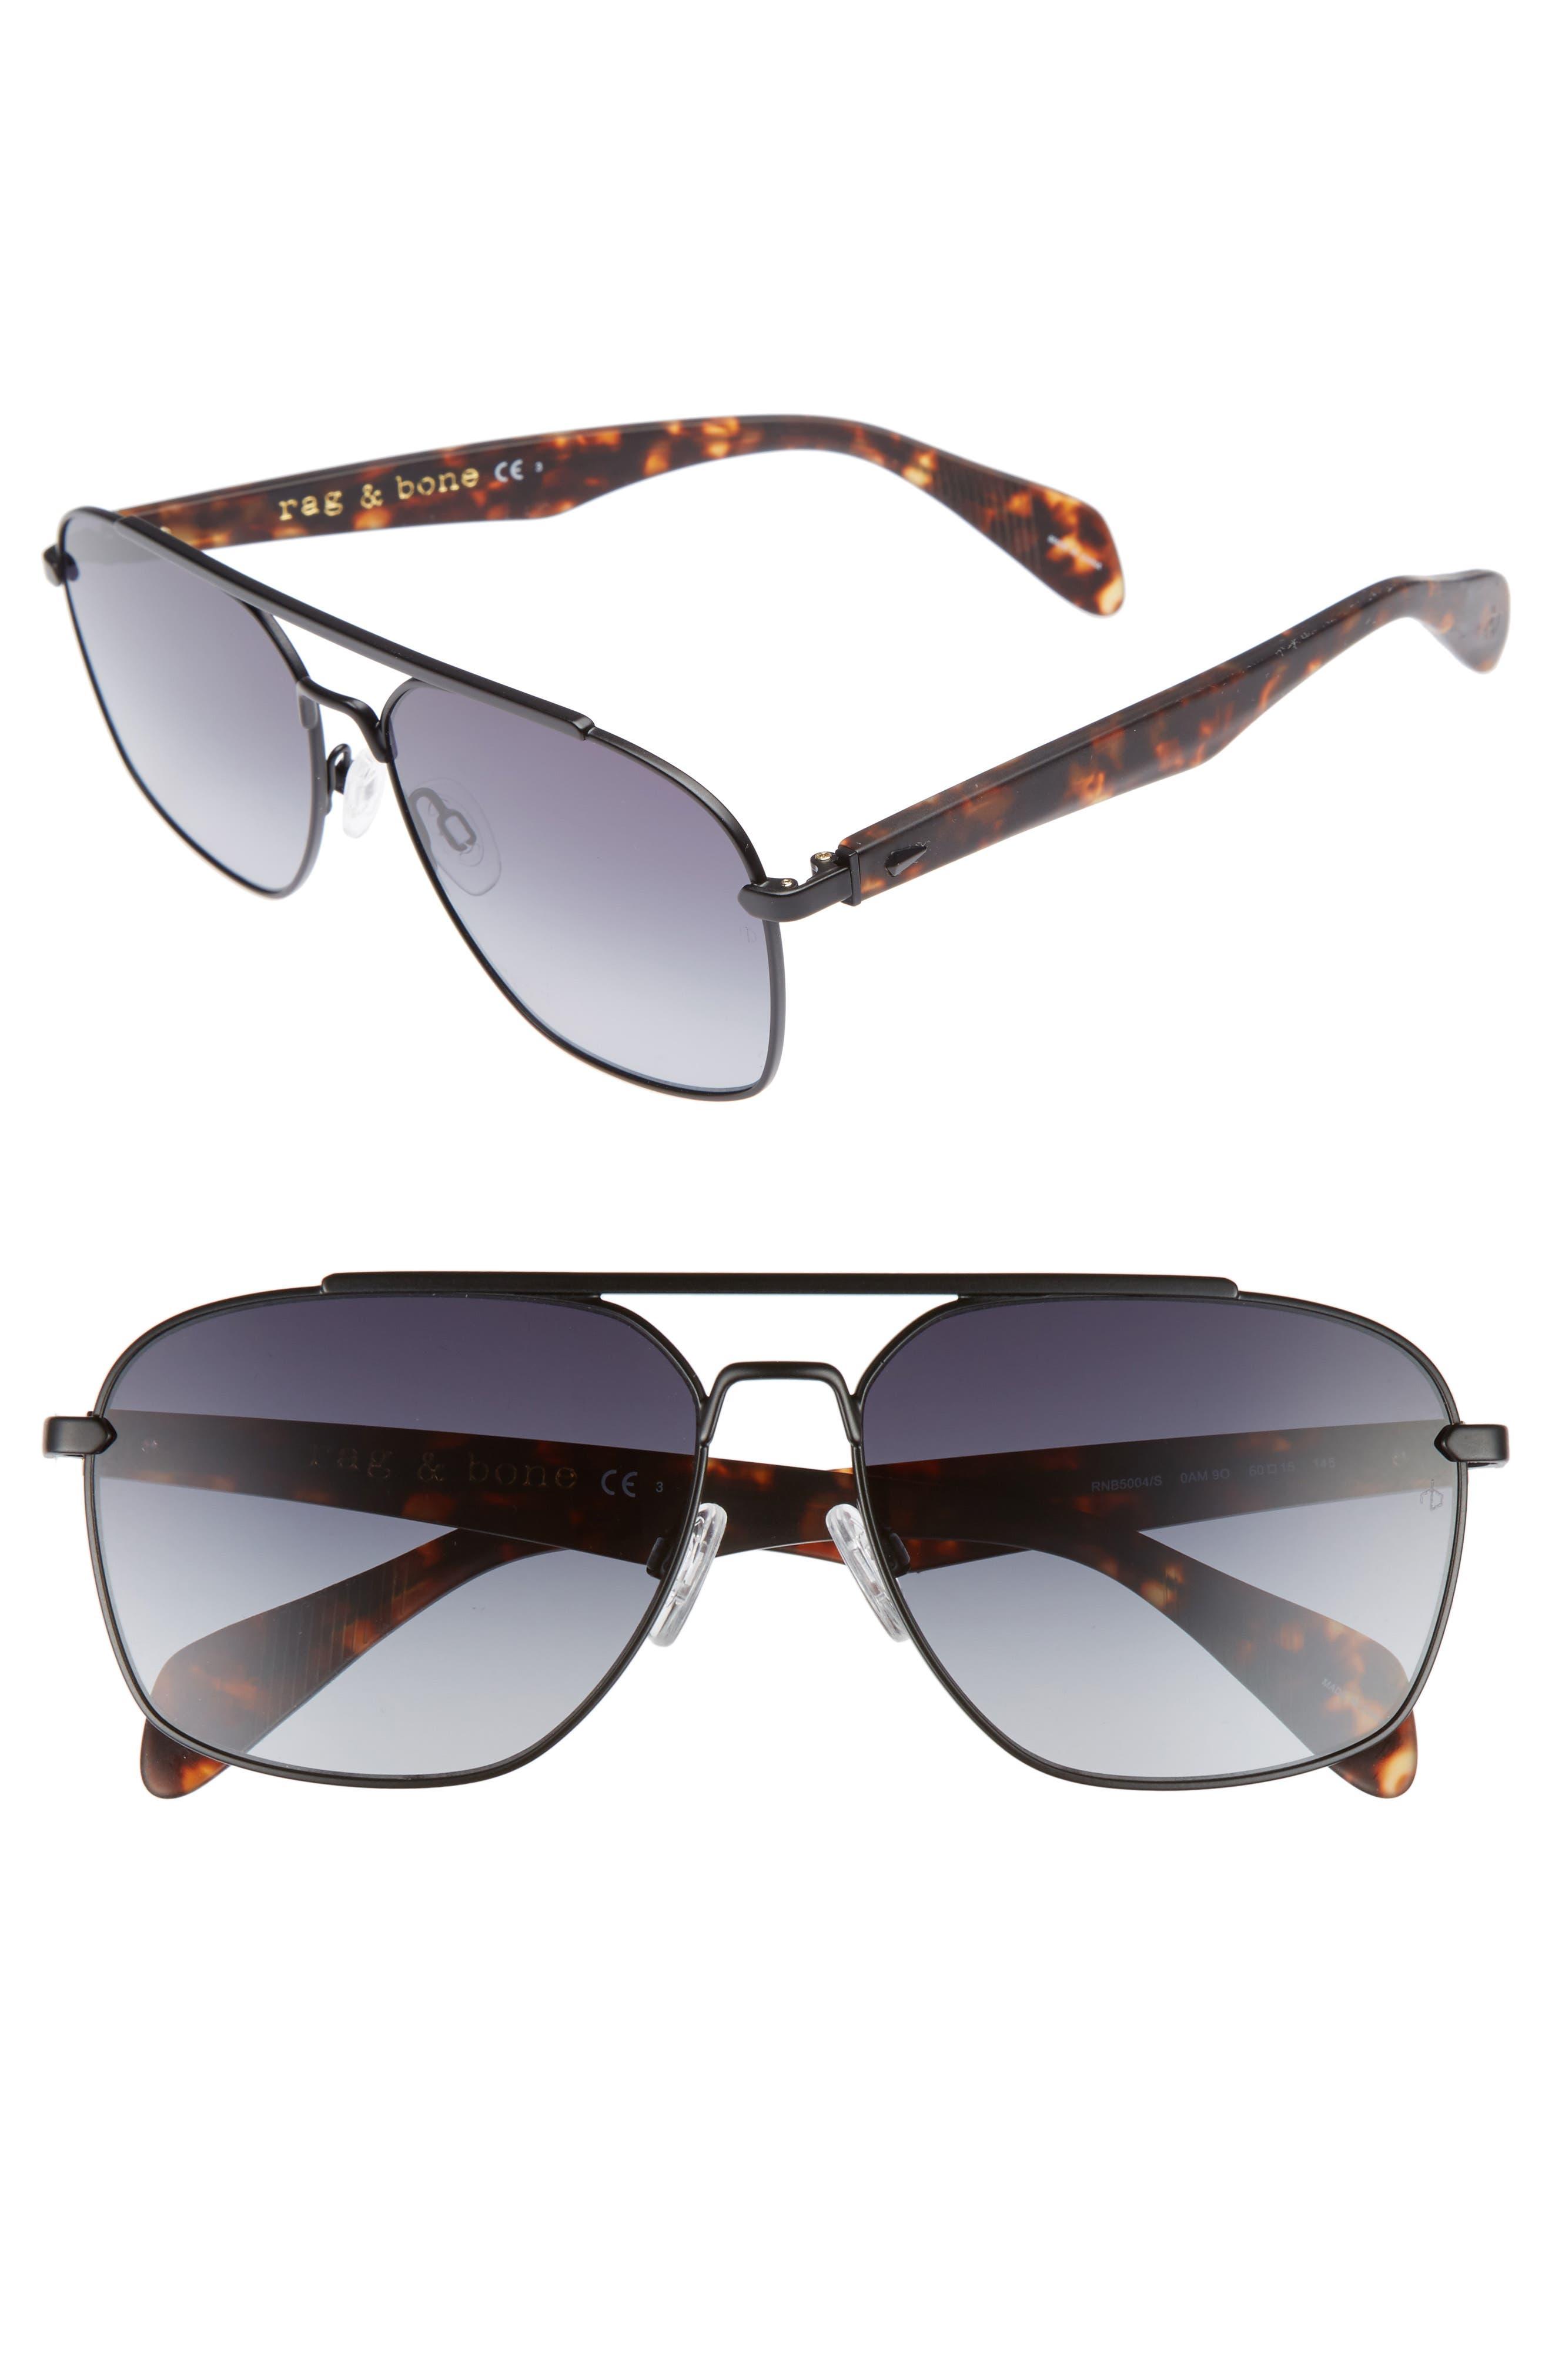 60mm Gradient Navigator Sunglasses,                             Main thumbnail 1, color,                             Matte Black/ Havana